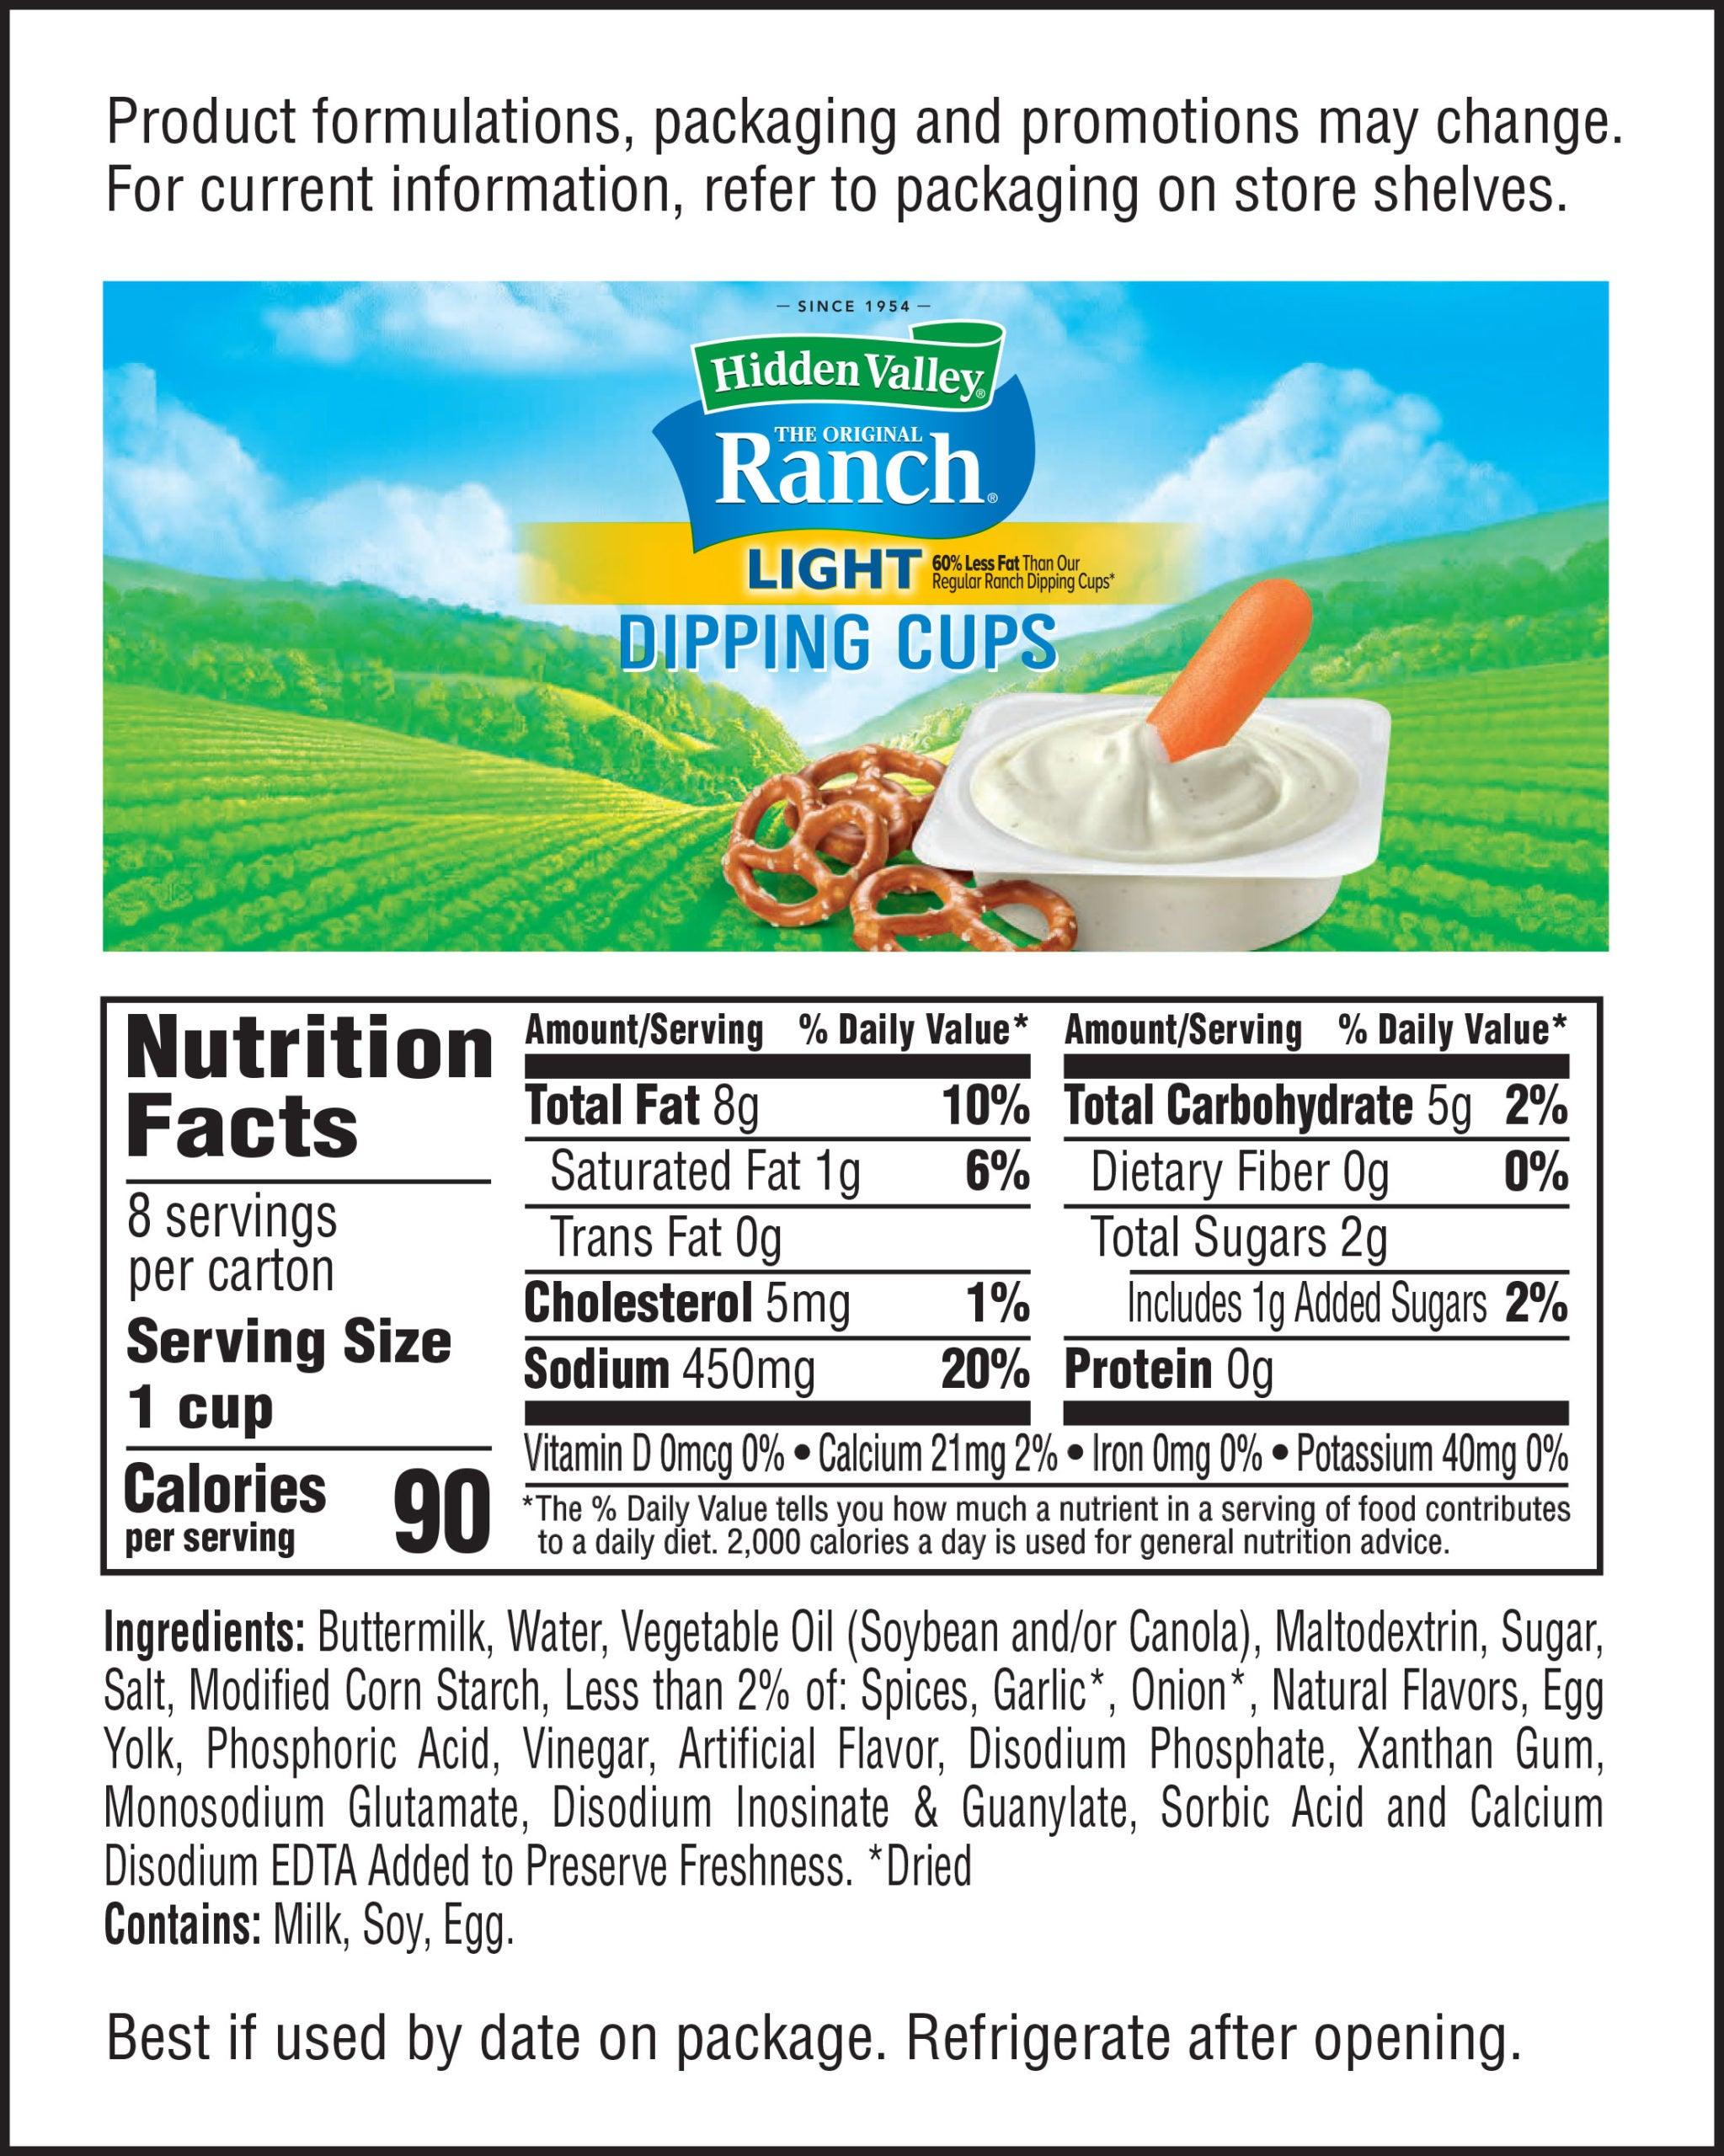 Hidden Valley® Ranch Light Dip Cups nutritional facts